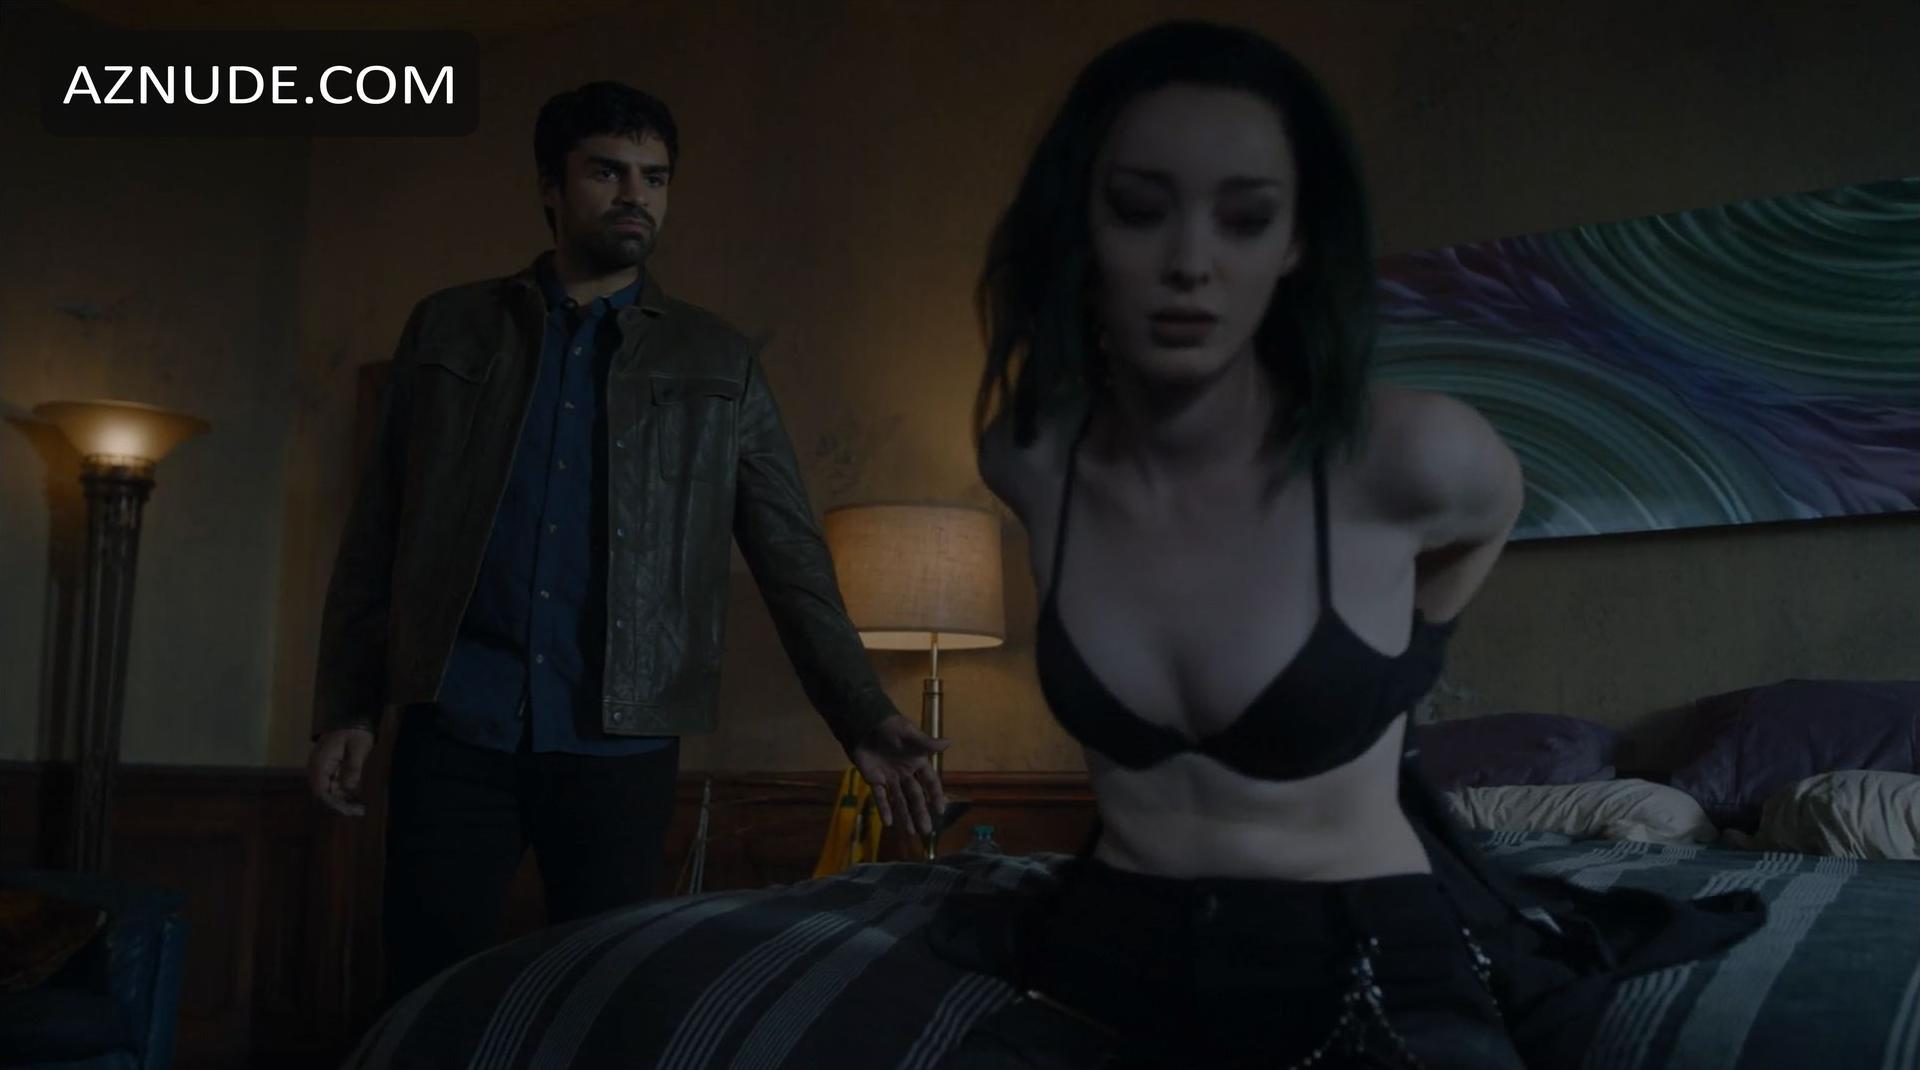 Erotica Emma Dumont nude photos 2019